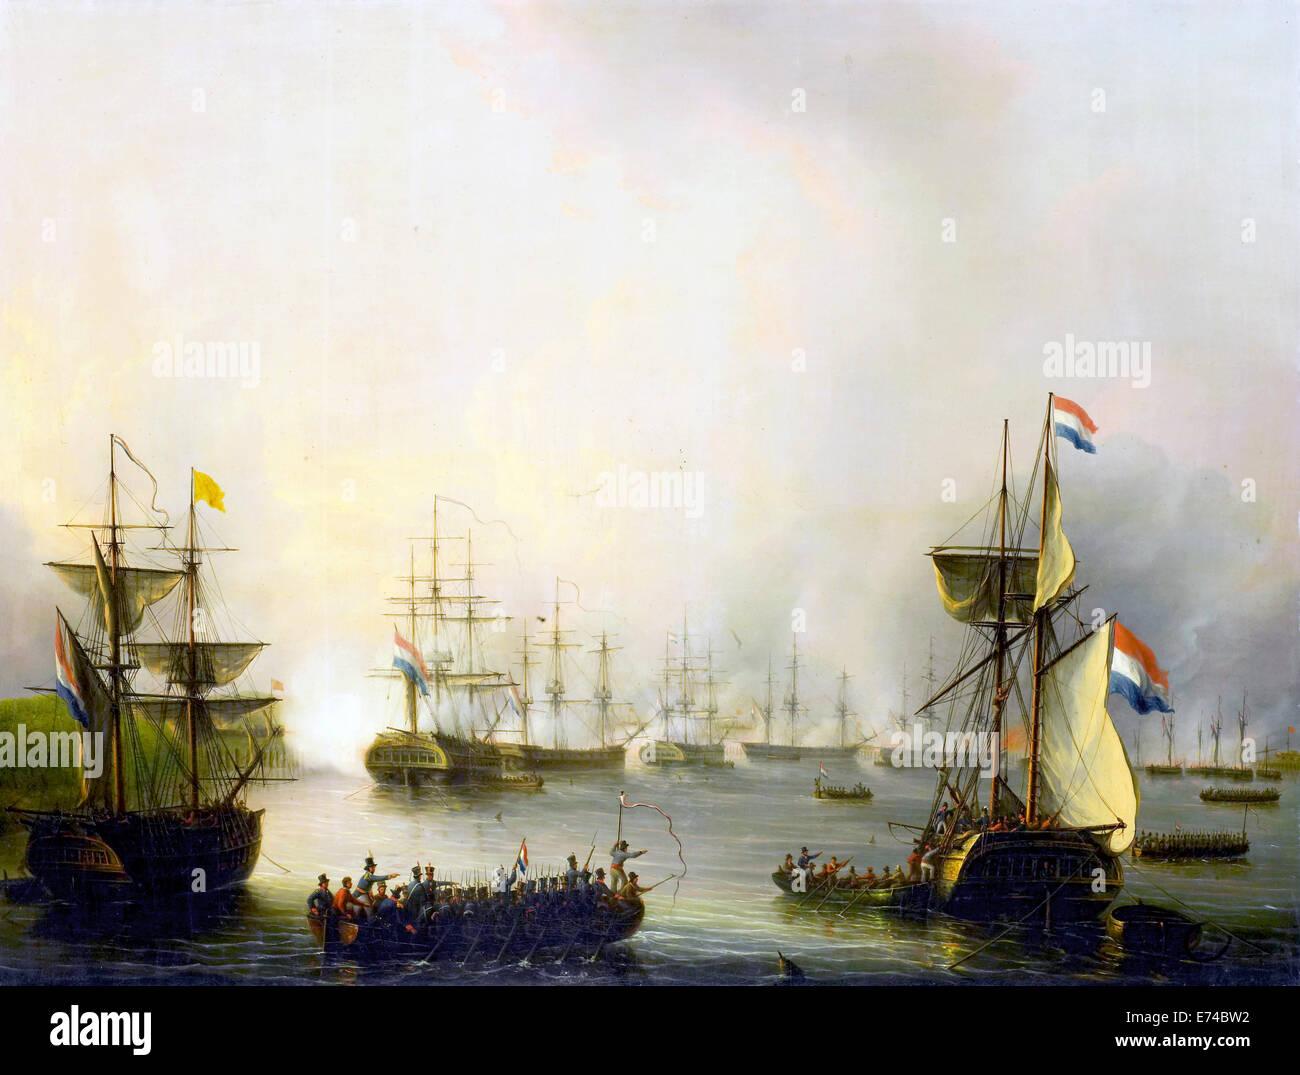 The shelling of Palembang, Sumatra, June 24, 1821 - by Martinus Schouman, 1821-1848 - Stock Image